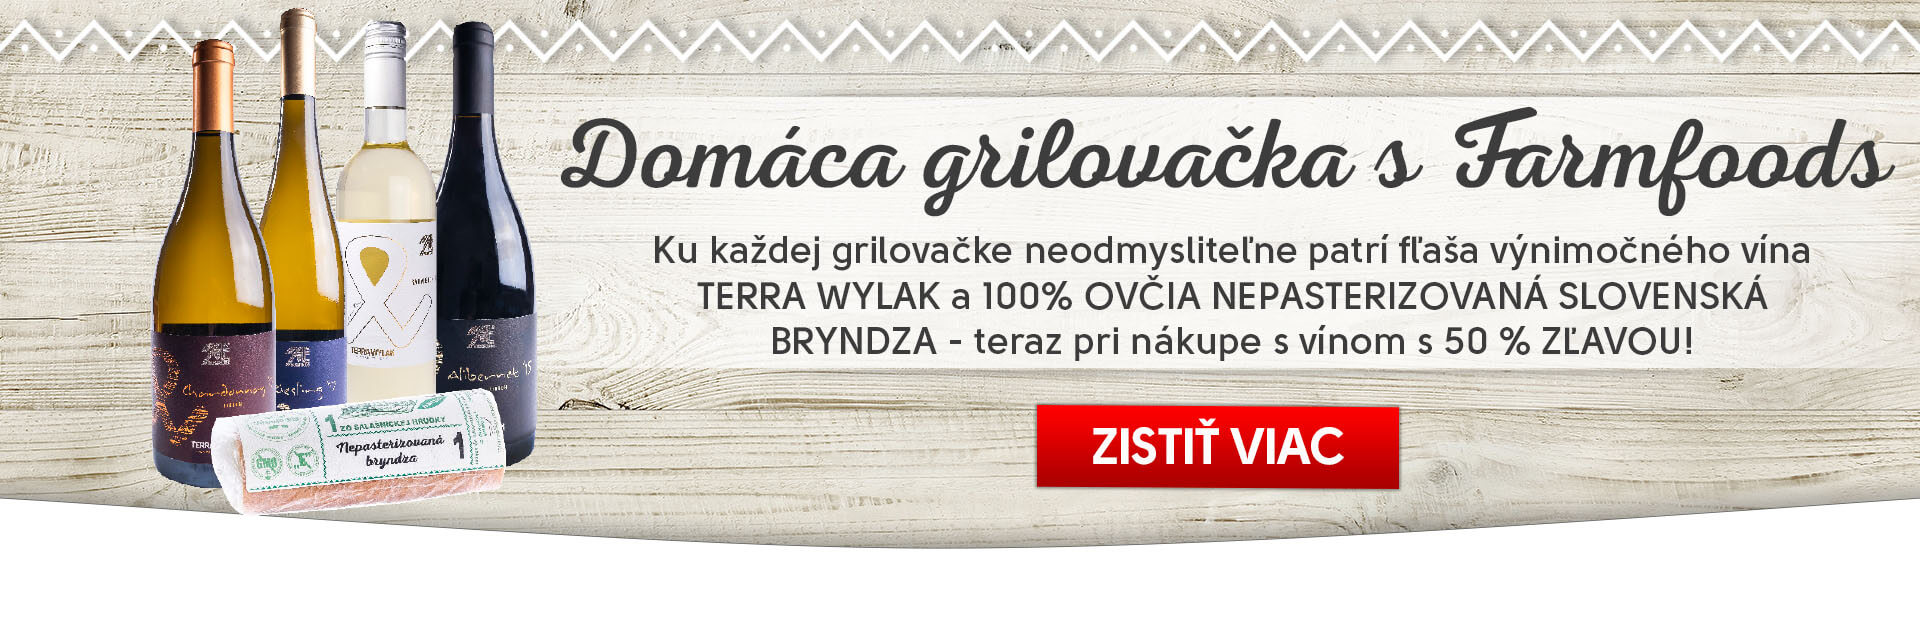 bryndza_akcia_2020_2